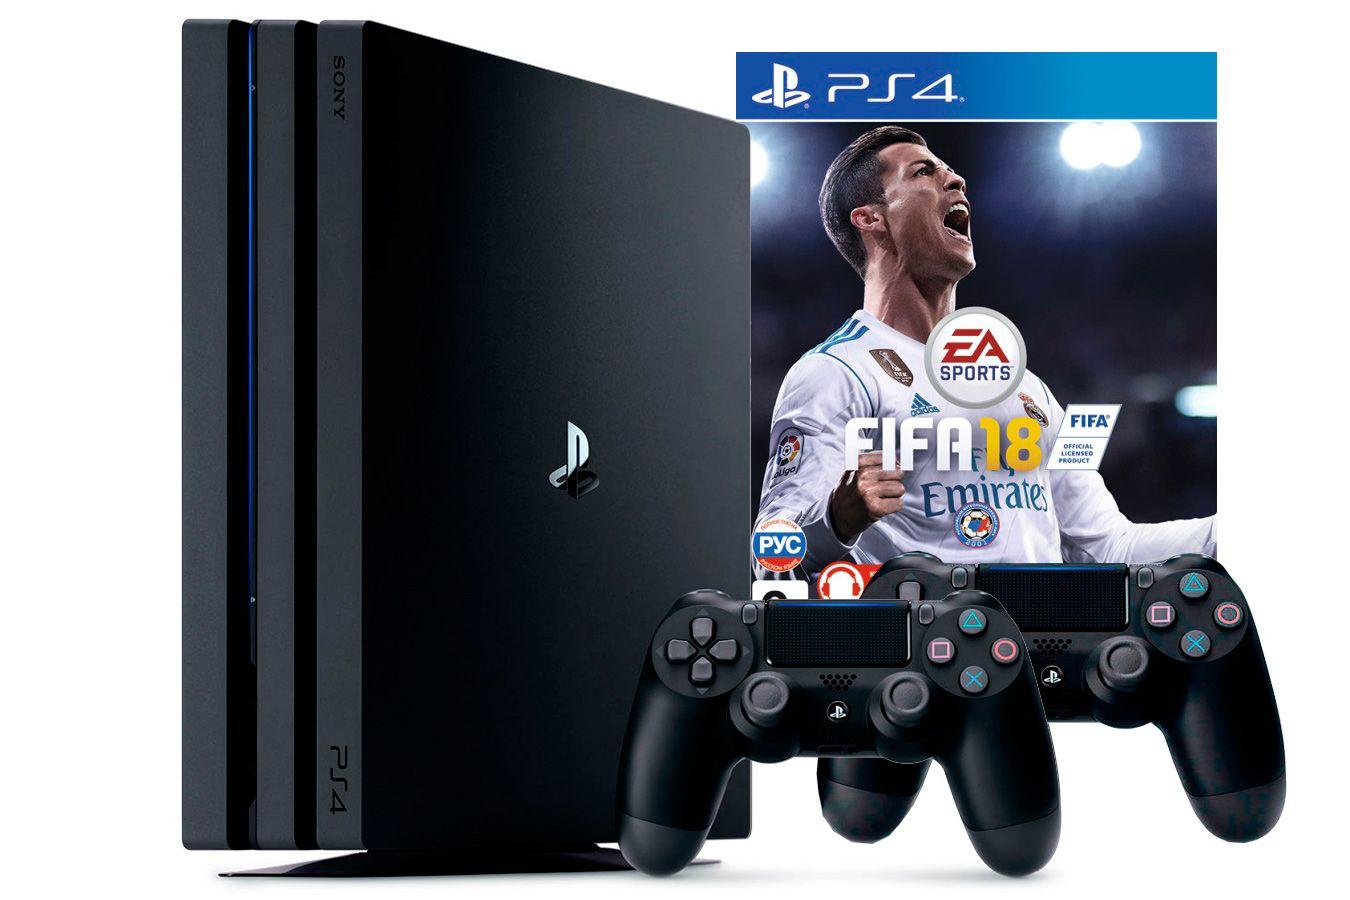 PlayStation 4 Pro 1Tb 2 джойстика, приставка и игра FIFA 18 [PS4P1J2F18]